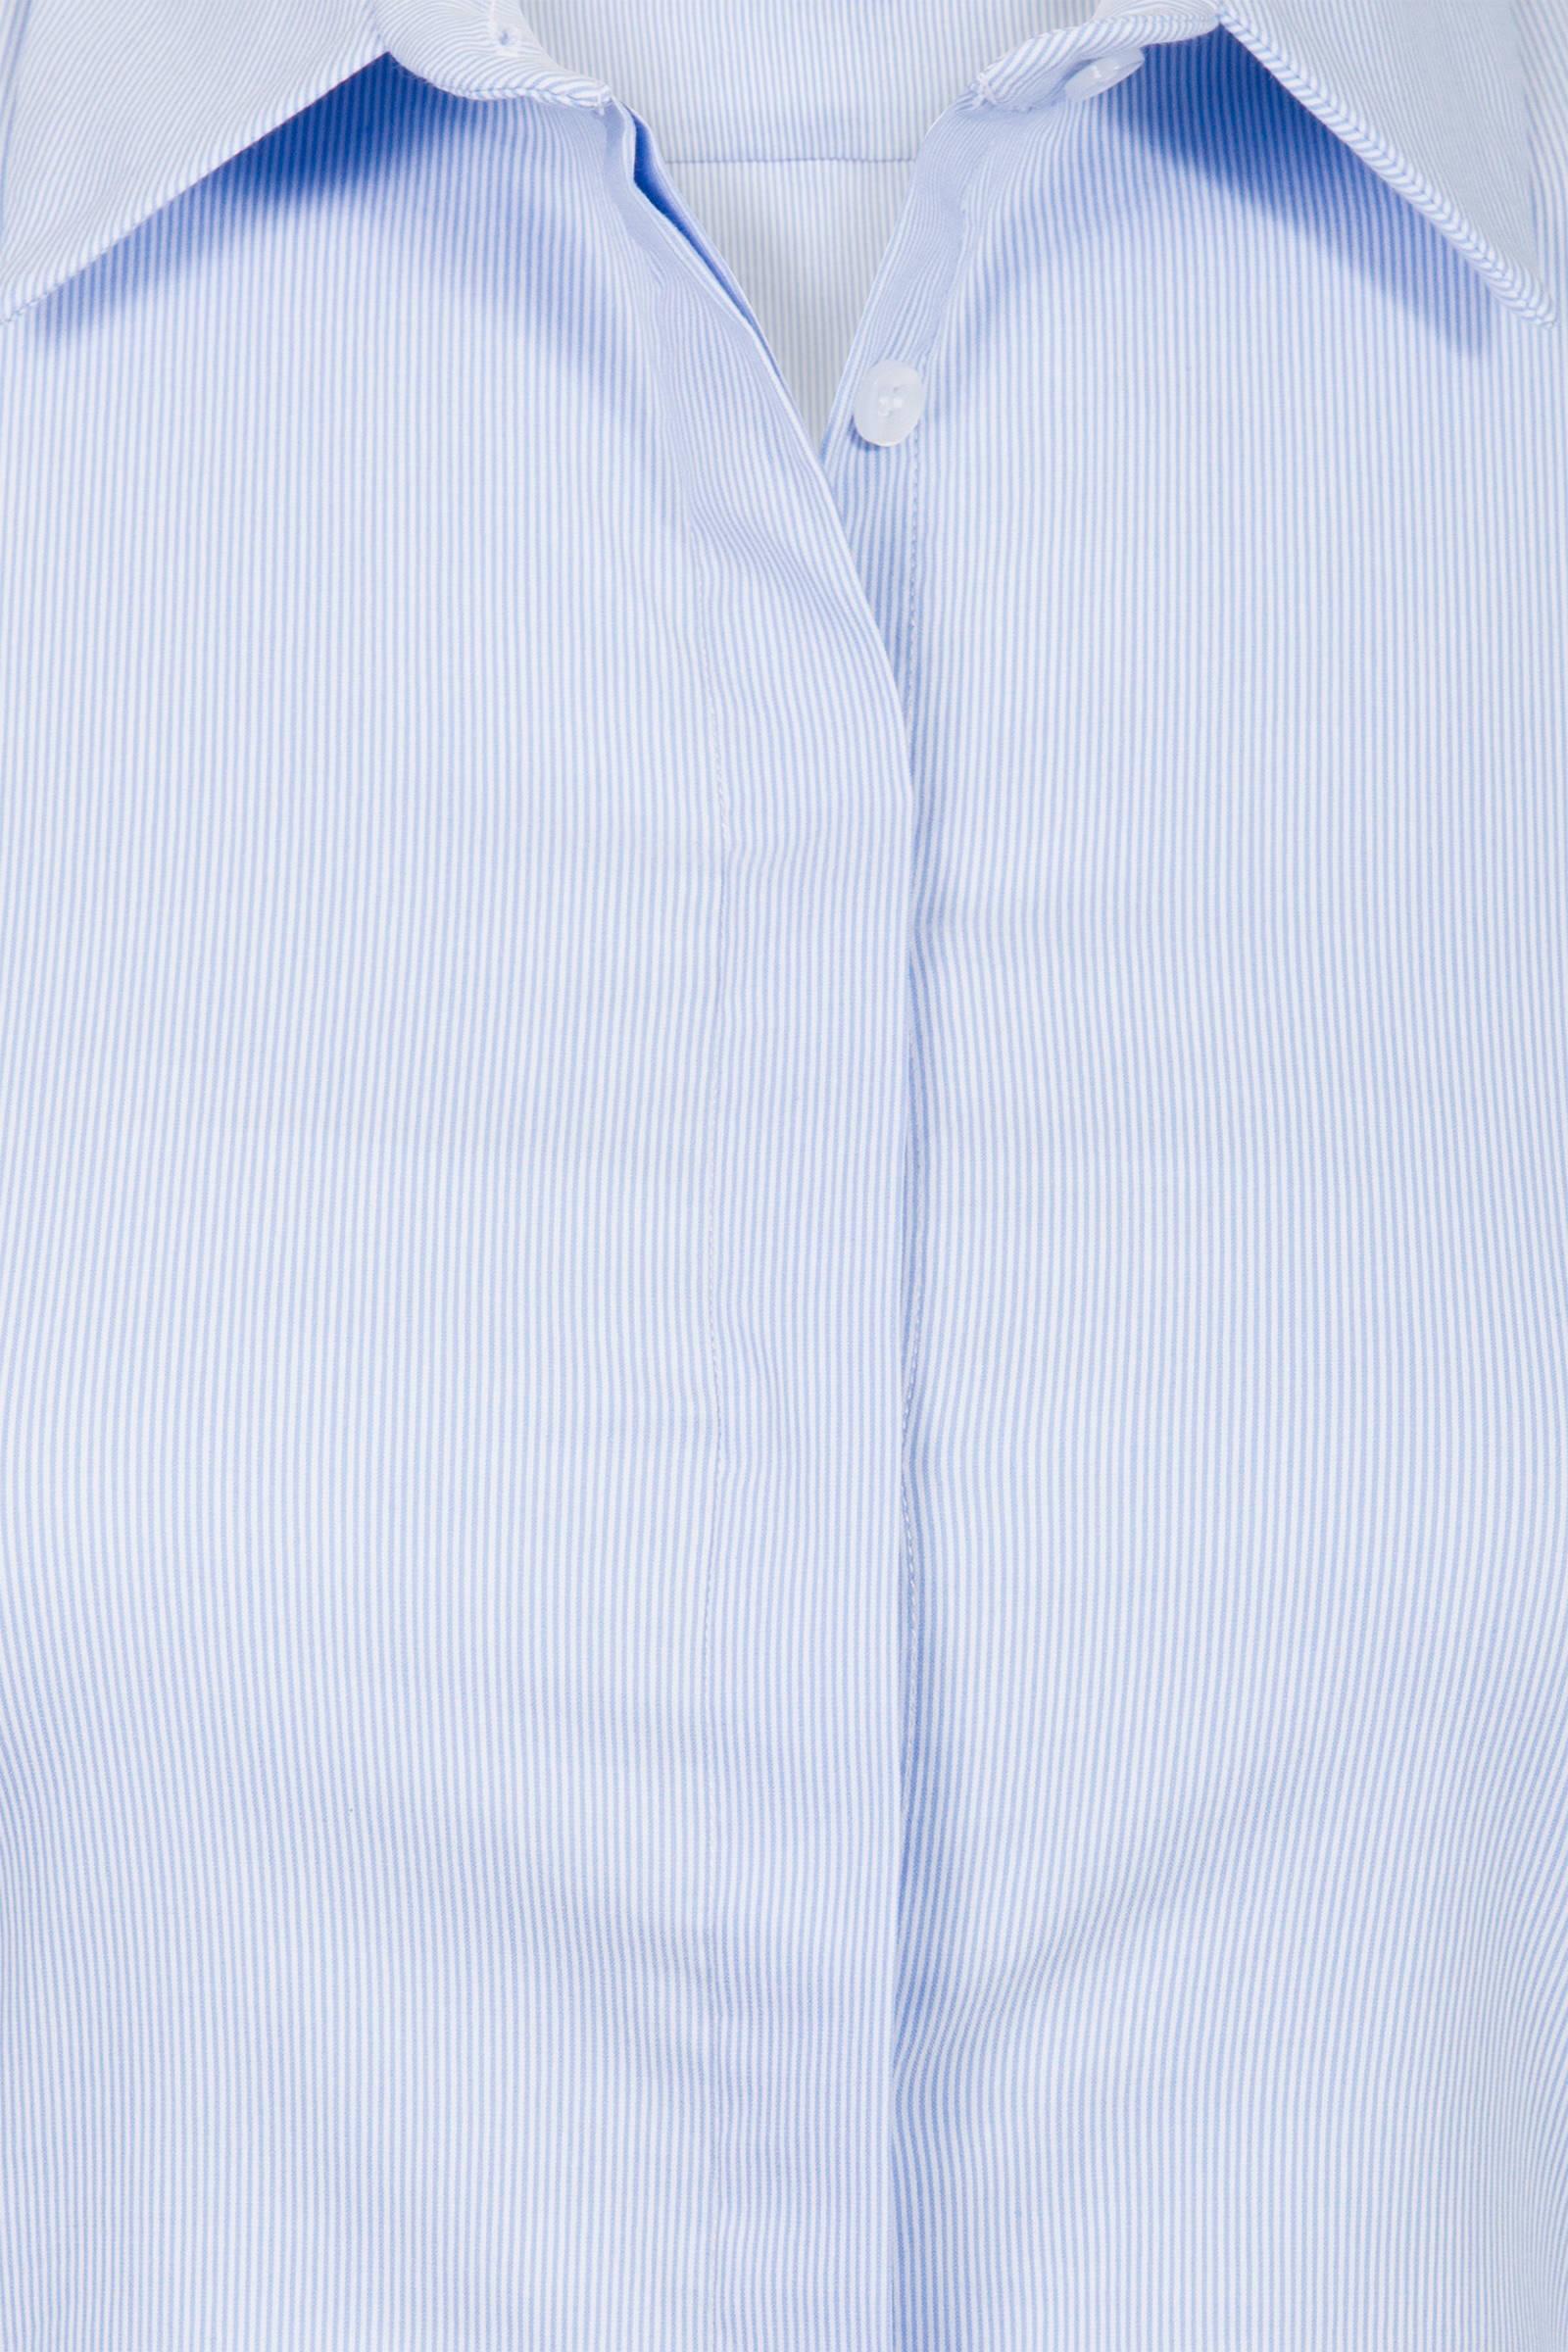 blouse Promiss Promiss Promiss lichtblauw blouse lichtblauw Promiss blouse blouse lichtblauw ETdqTn